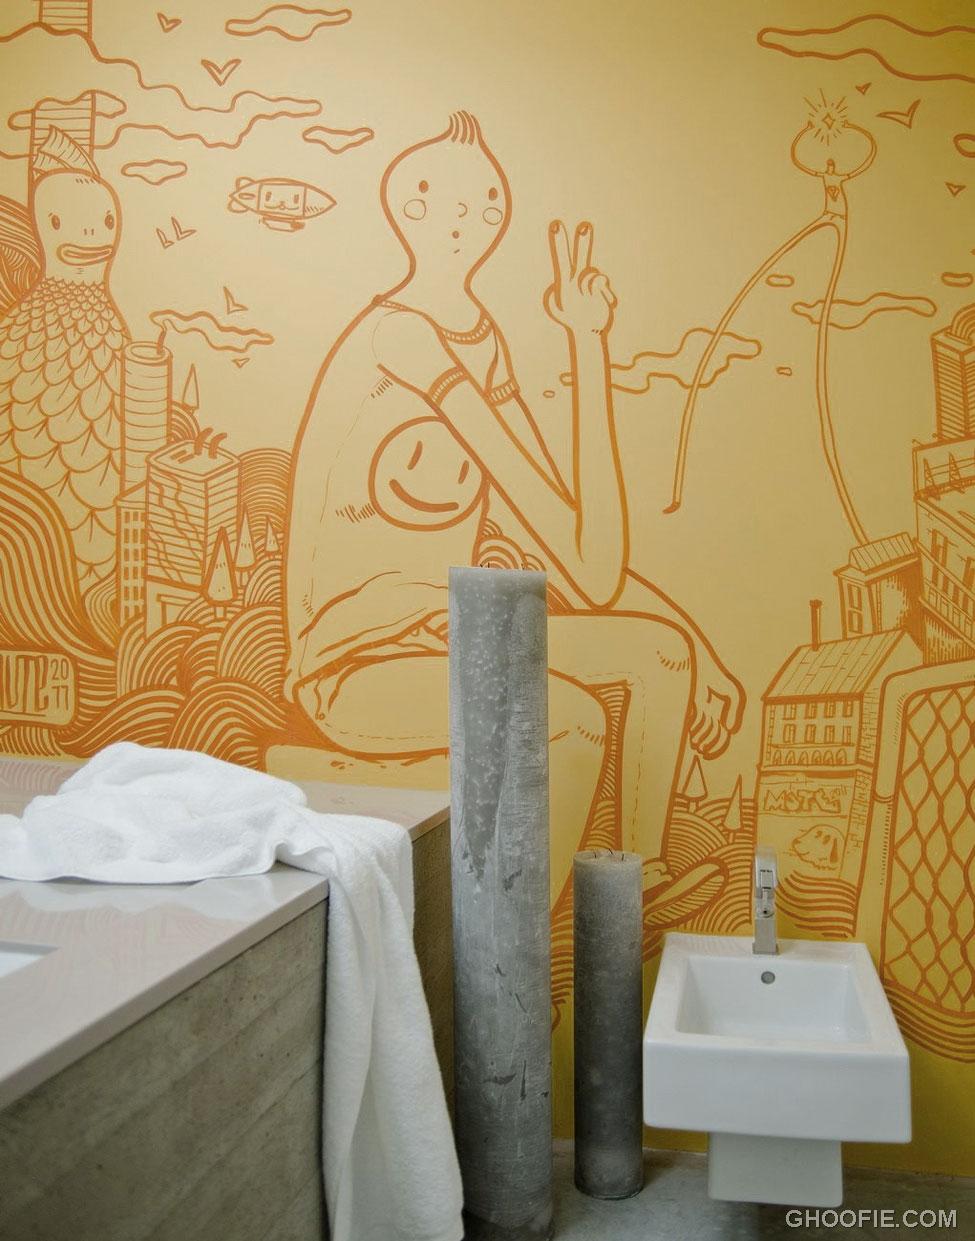 Tintin Illustrative Wall Art Mural Bathroom